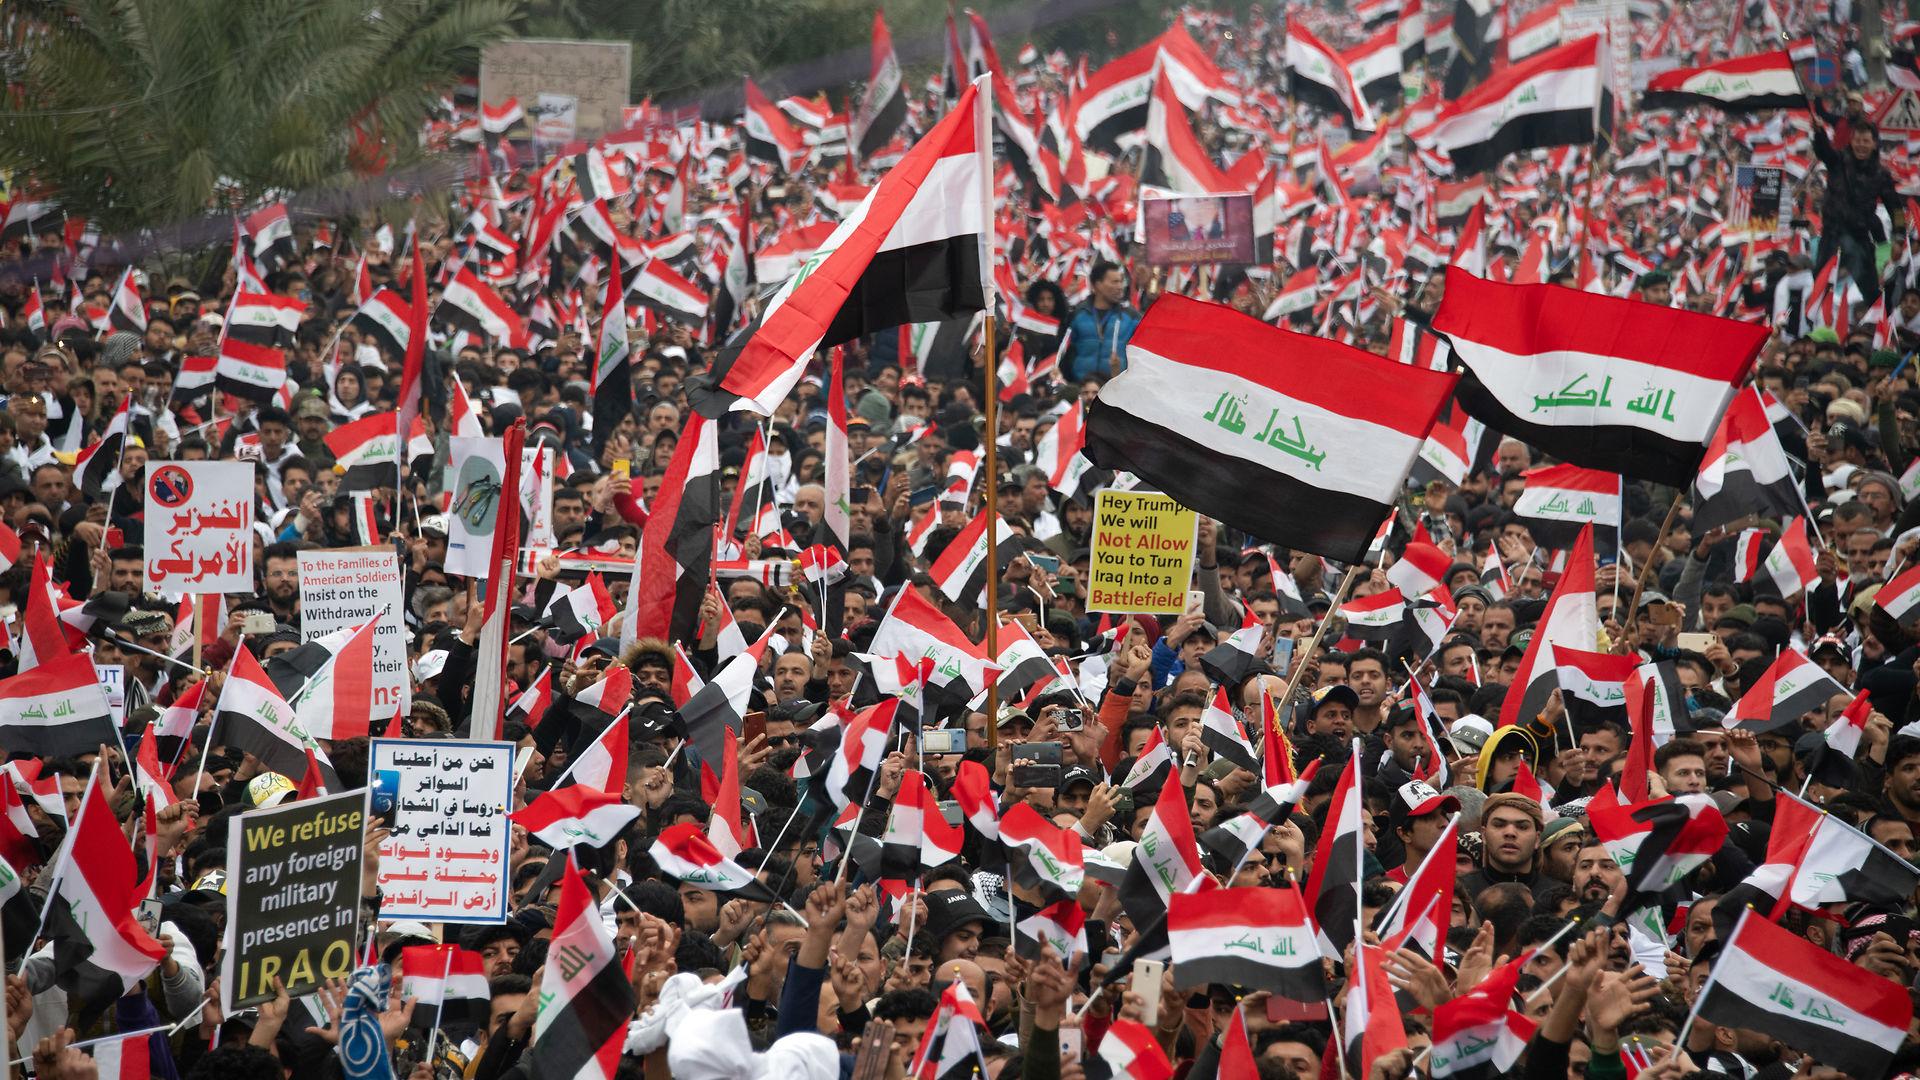 Maria-Louise Clausen: USA og Iran bruger Irak som slagmark. Men hvornår må irakerne bestemme i Irak?